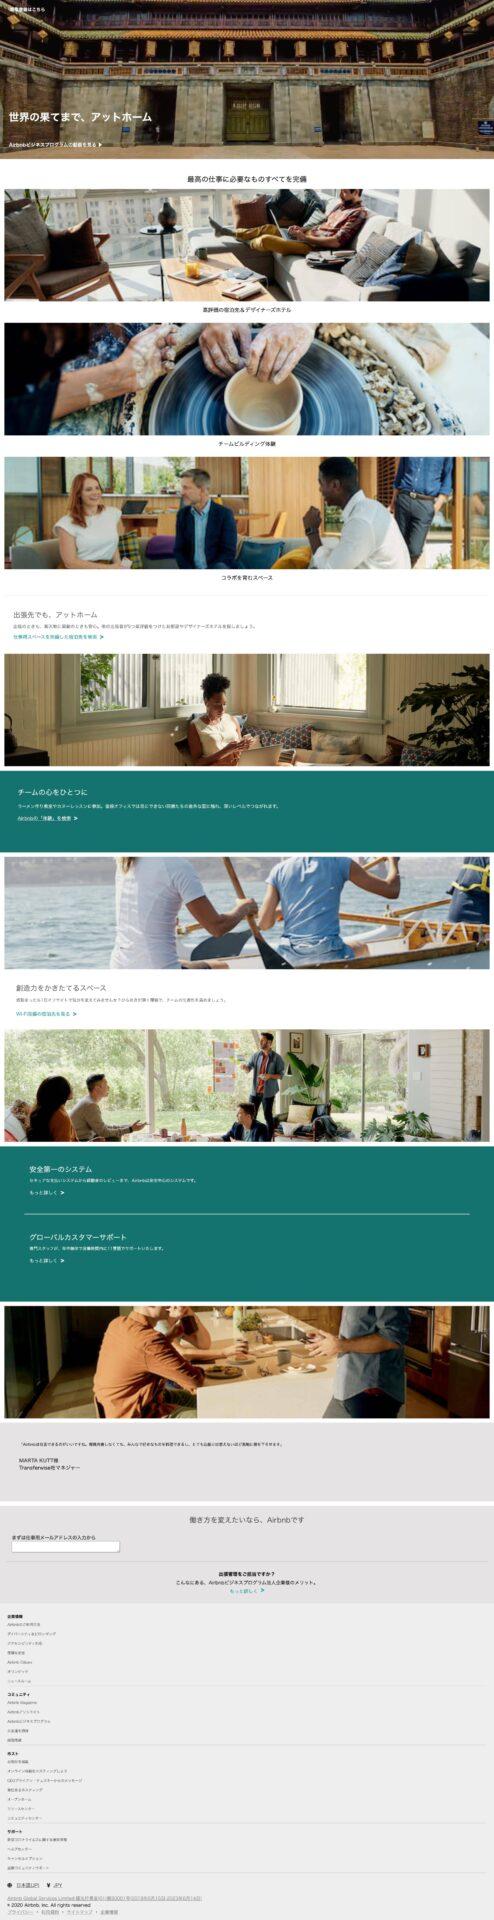 Airbnb_bisiness_模写